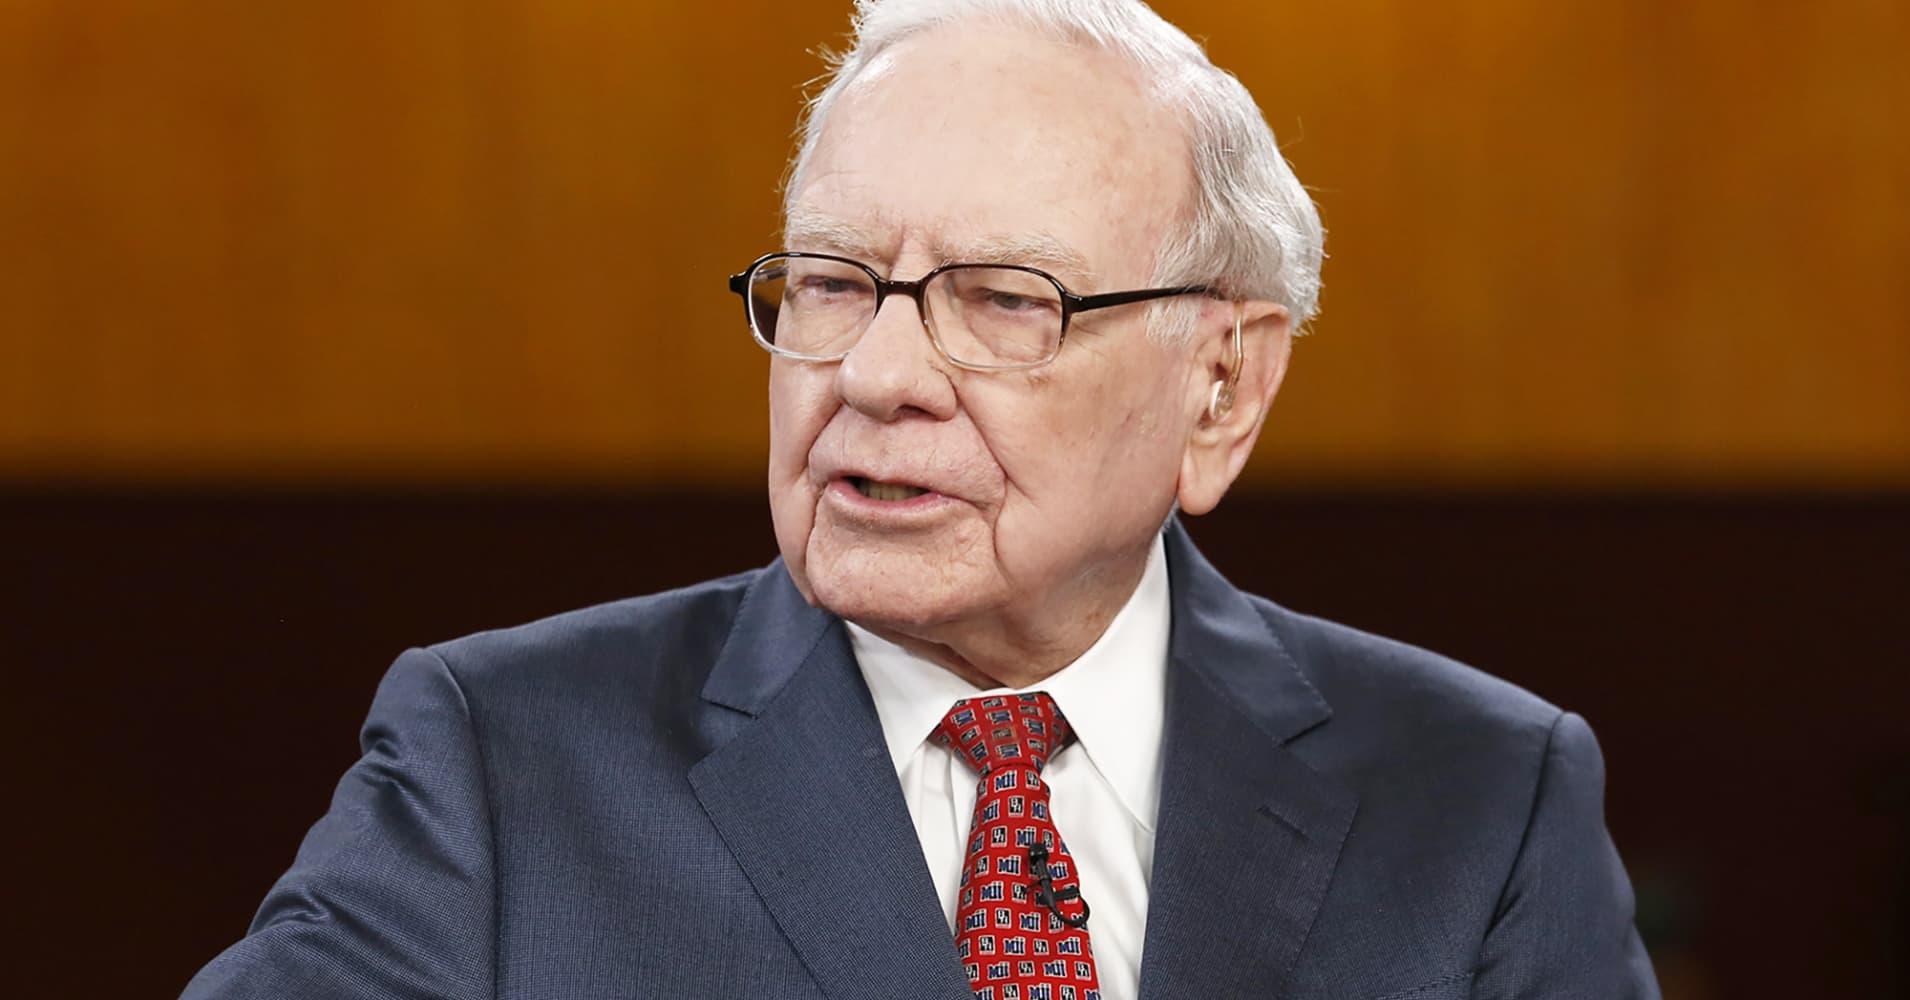 Berkshire Hathaway shares look really cheap using Warren Buffett's own method of valuing stocks